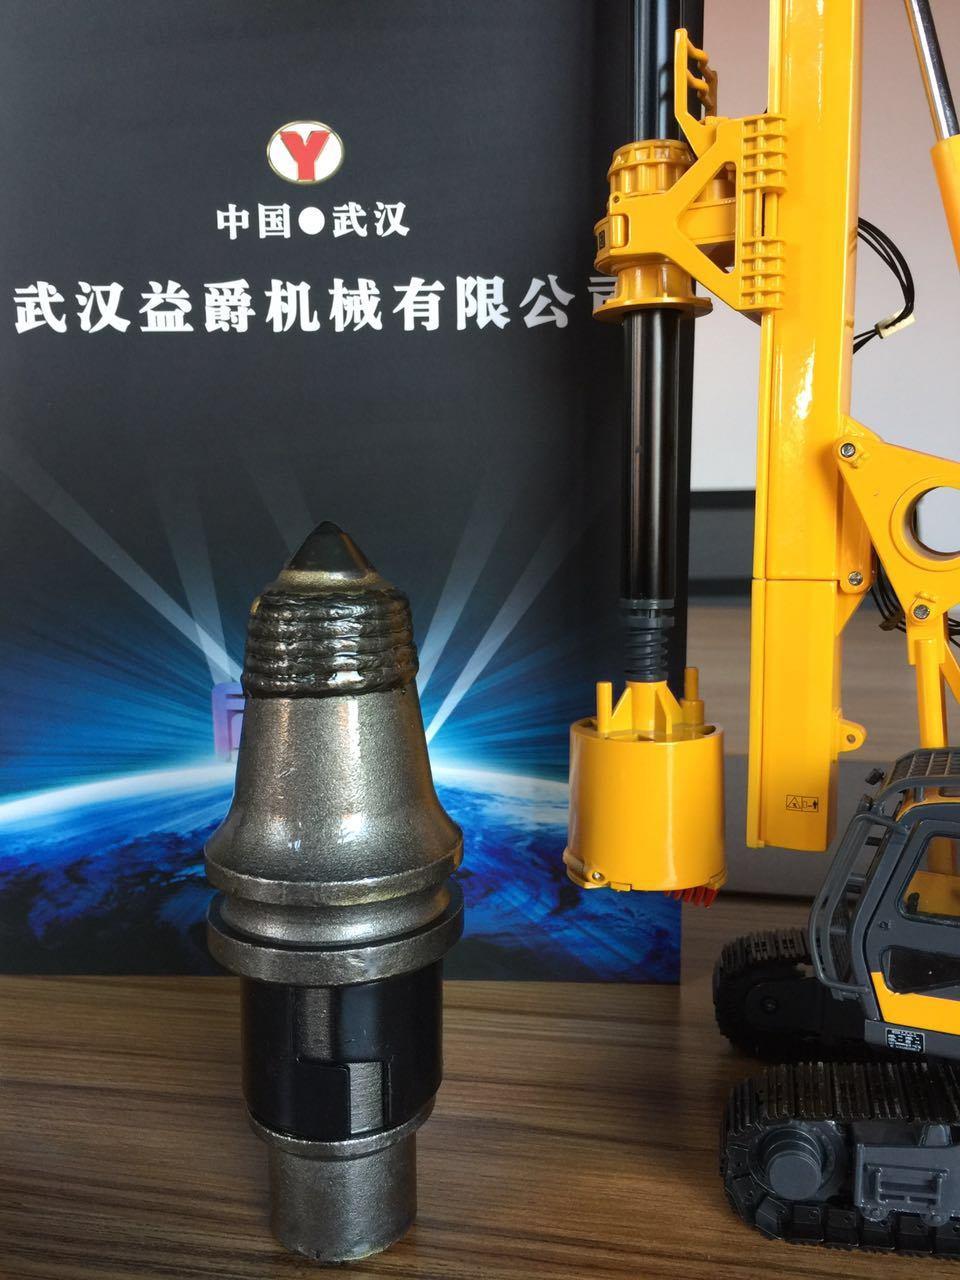 Jc-130 High Quality Alloy Bit Drill Bits